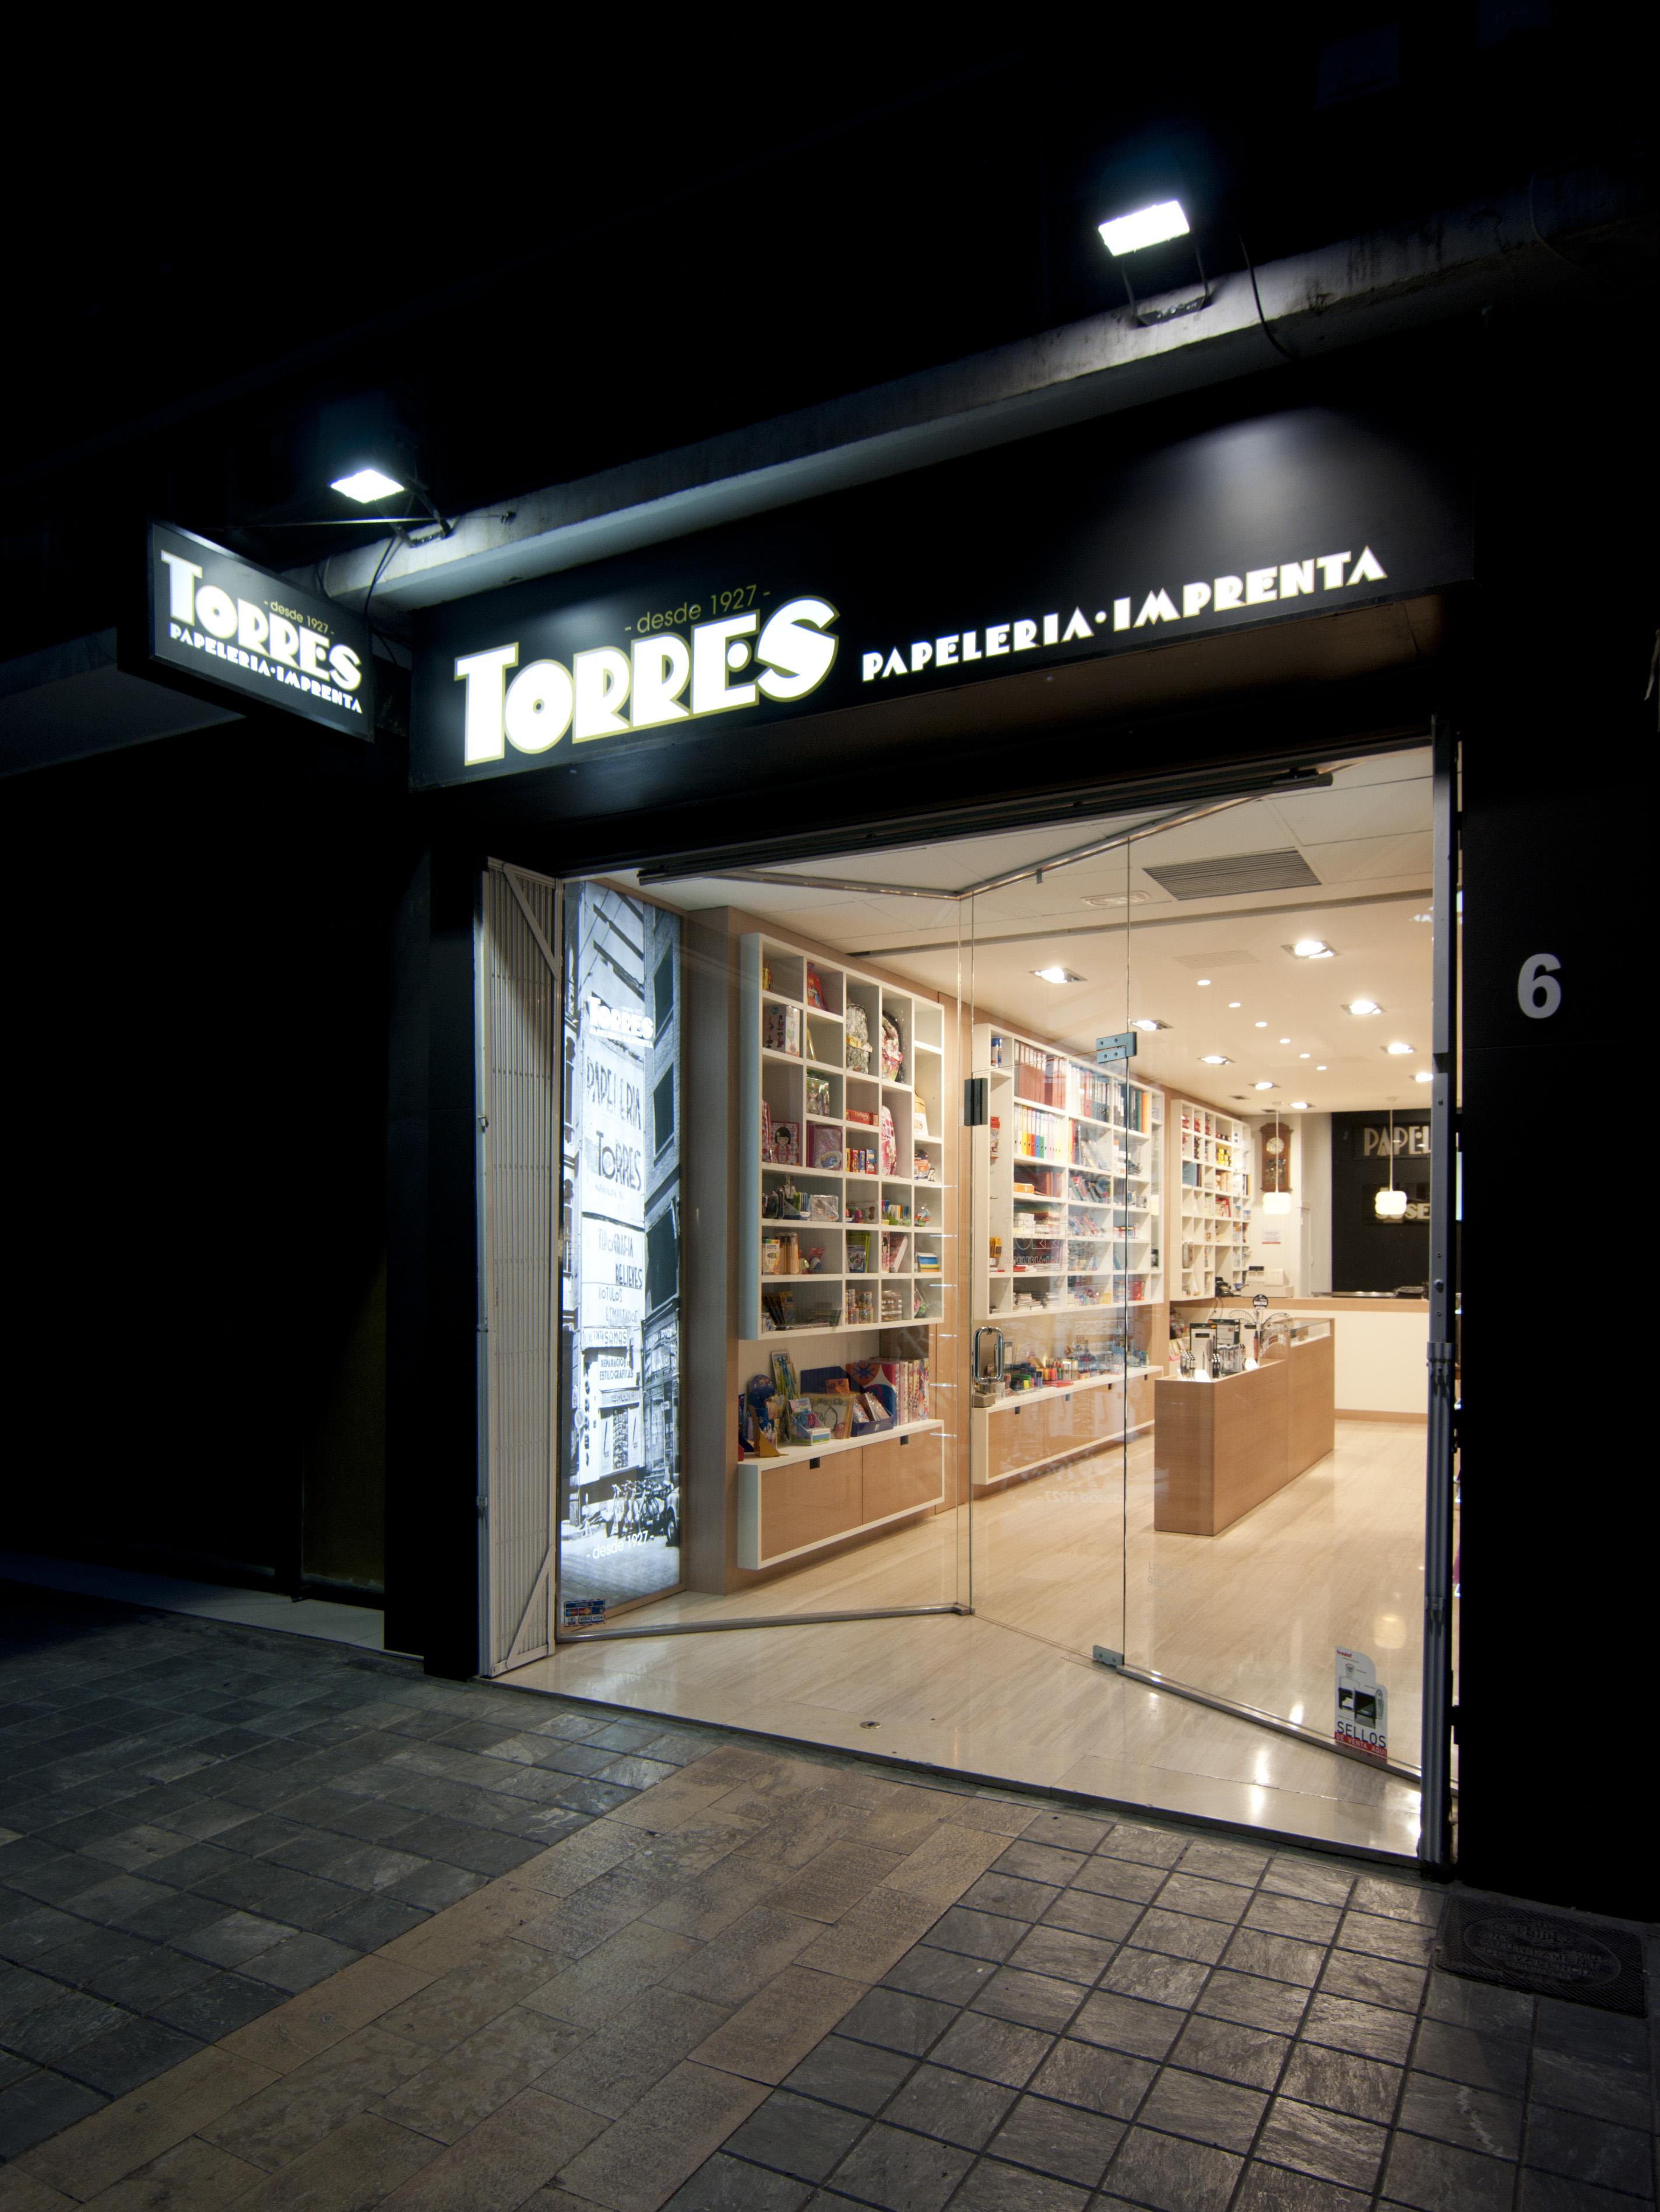 Insca Insca Shopfitting Archello # Muebles Villarreal